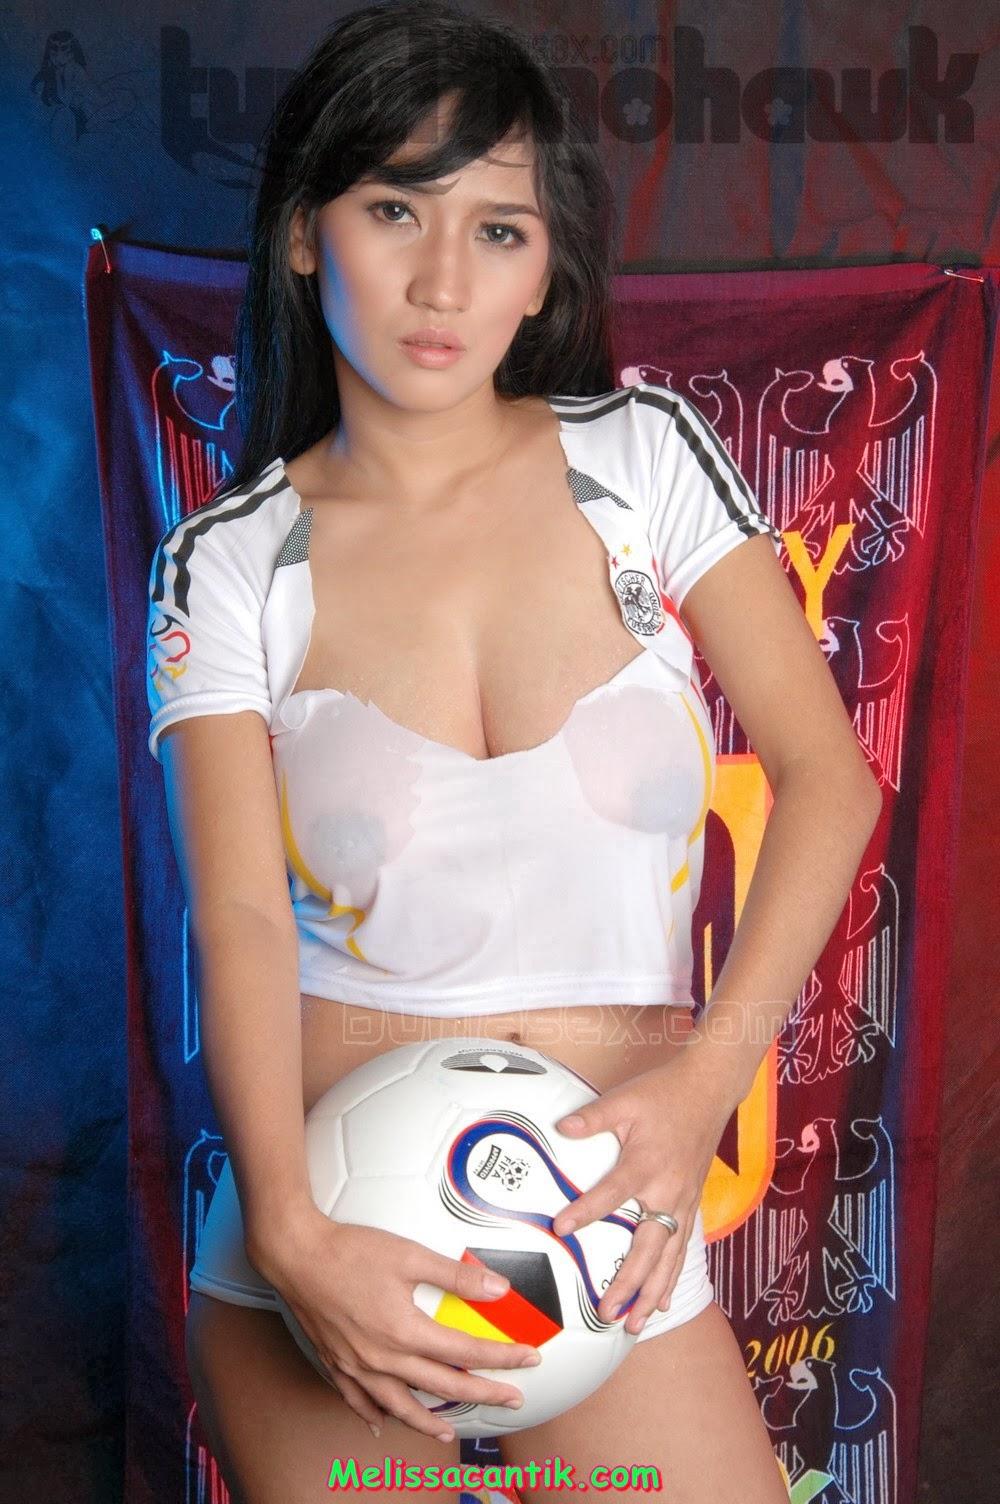 Indonesian Football Girl - Foto Model Seksi Pakai Jersey -2062